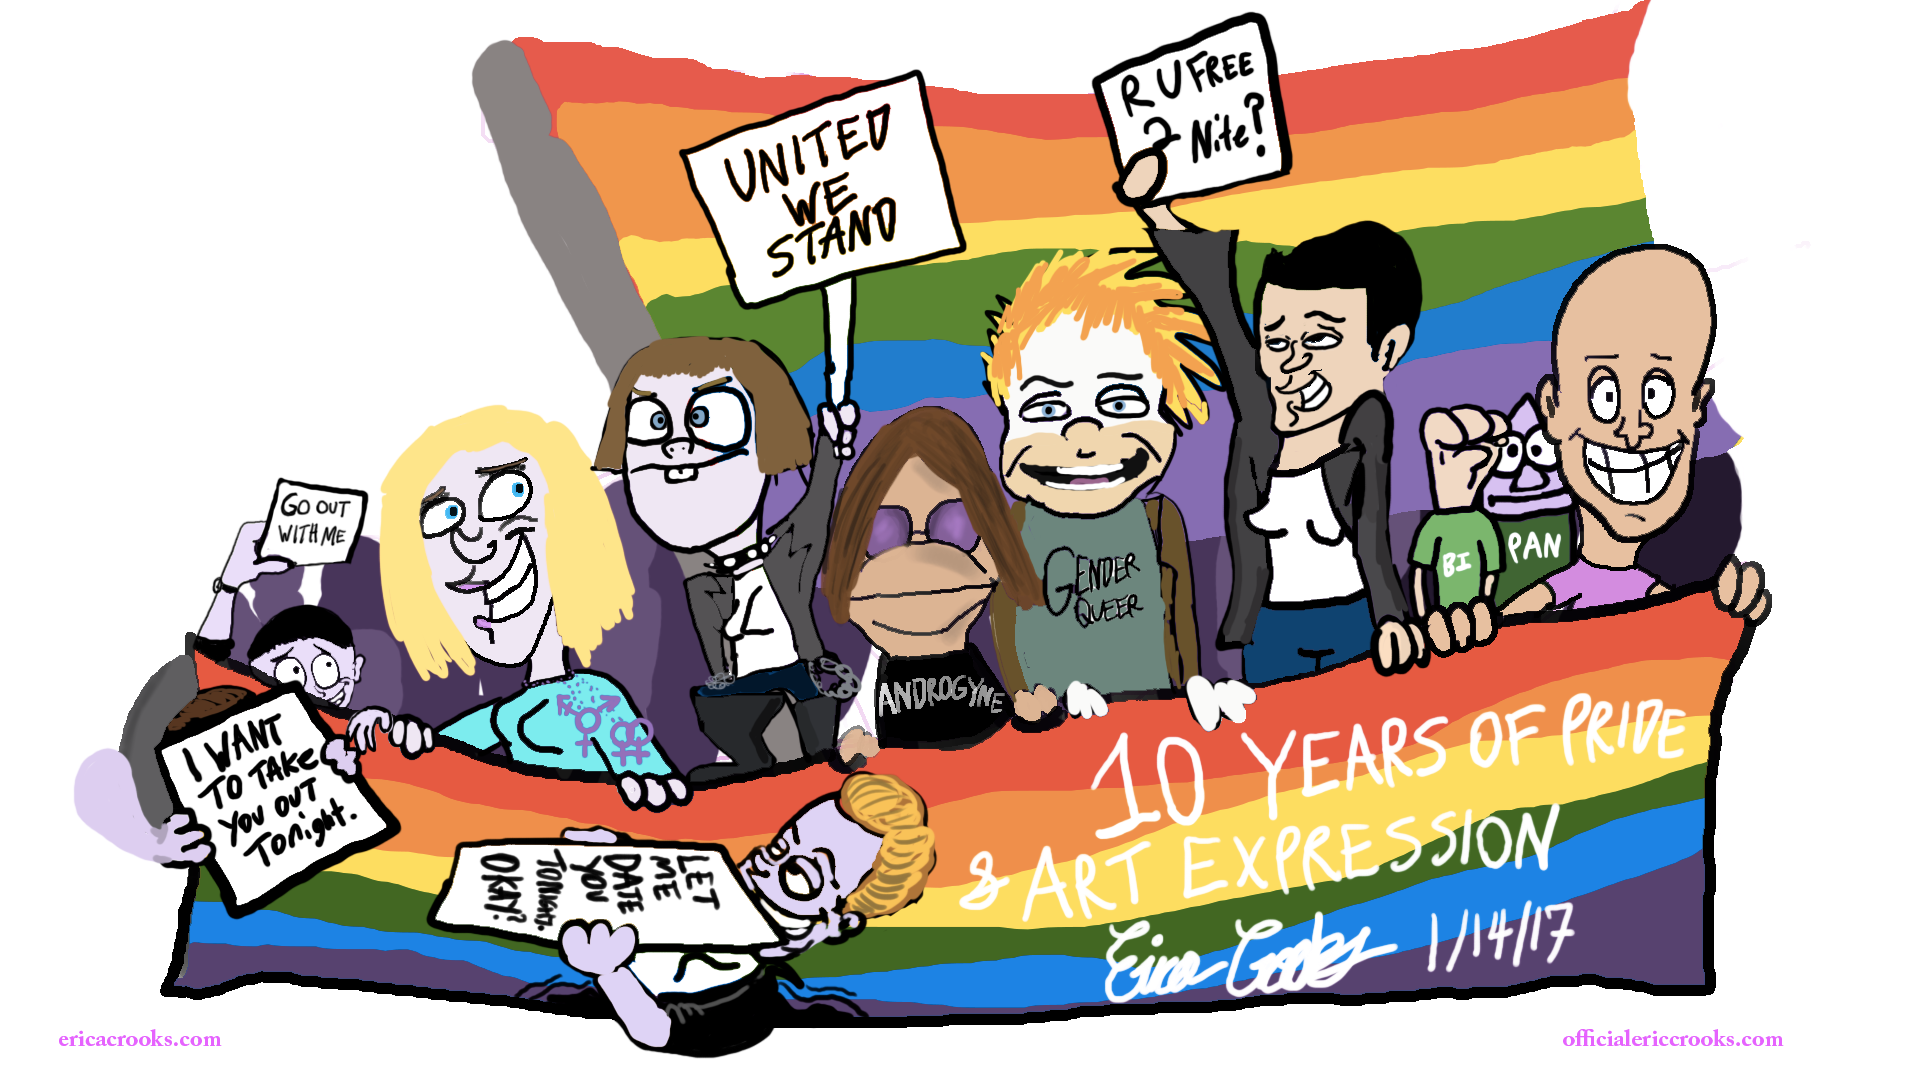 Erica Crooks - 10 years of LGBTQ Pride